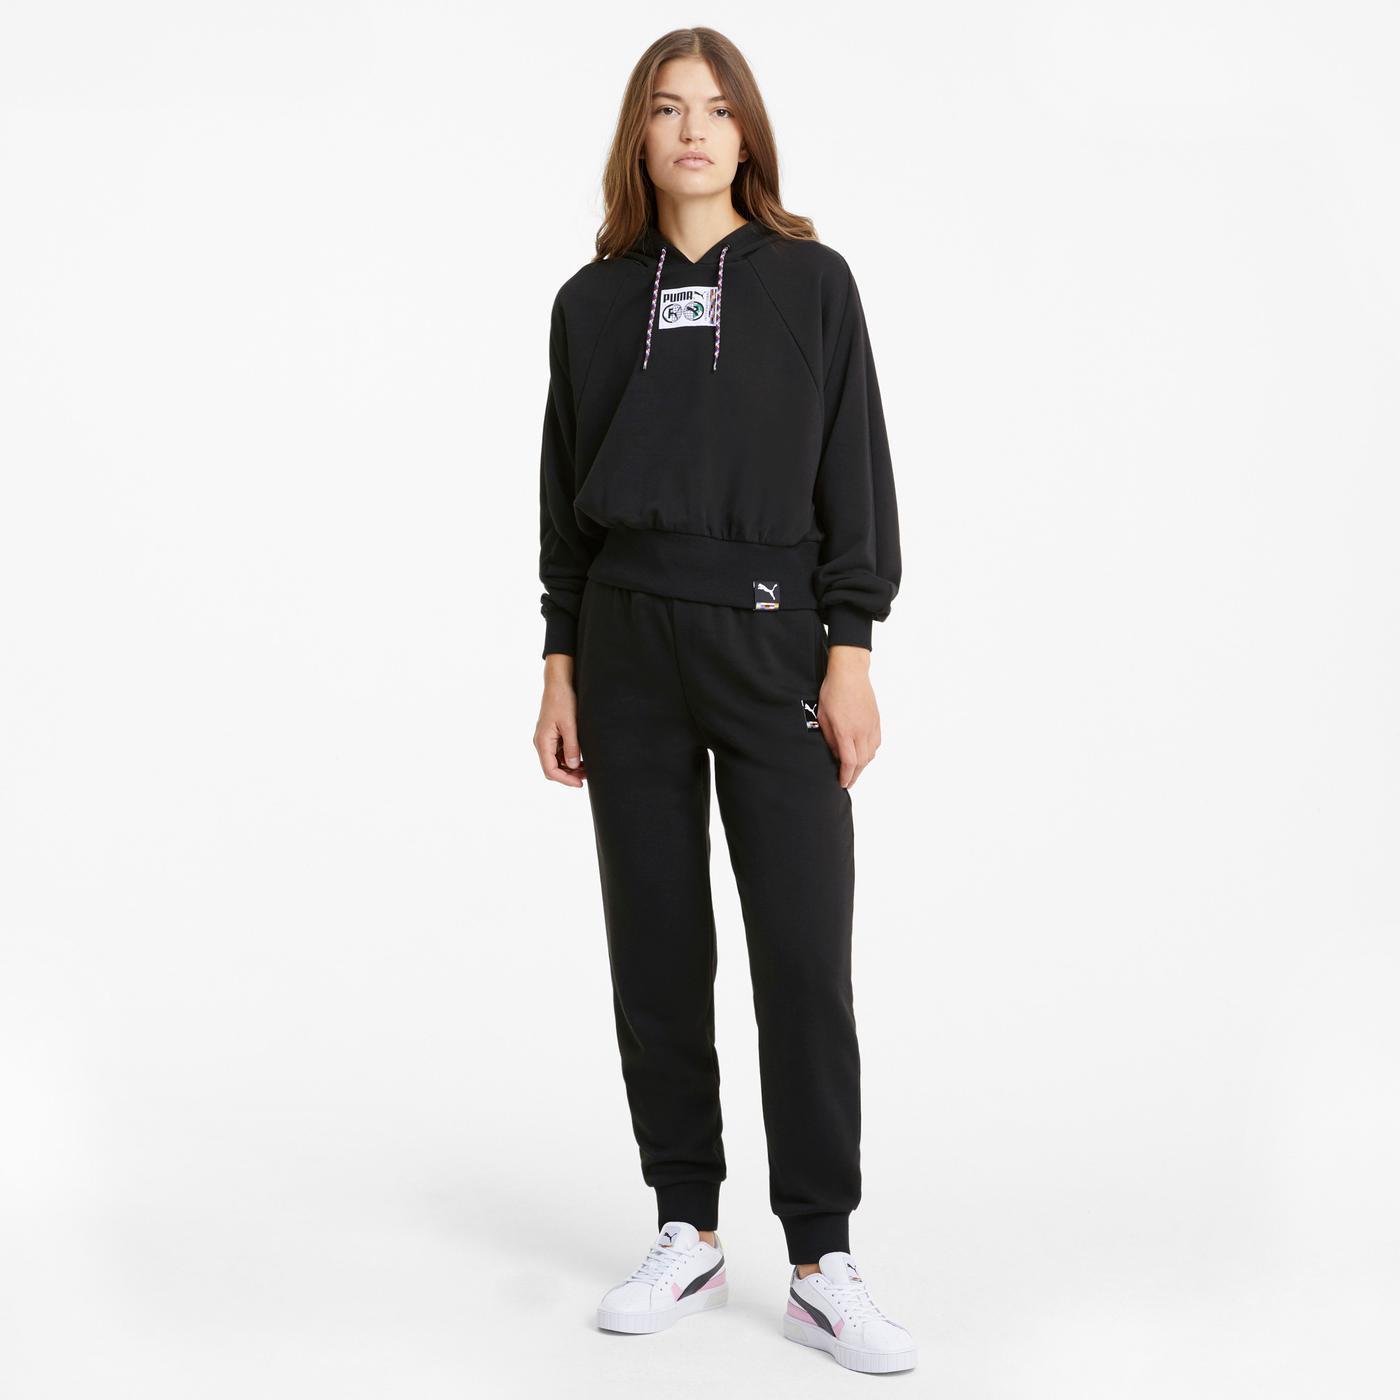 Puma International Kadın Siyah Sweatshirt